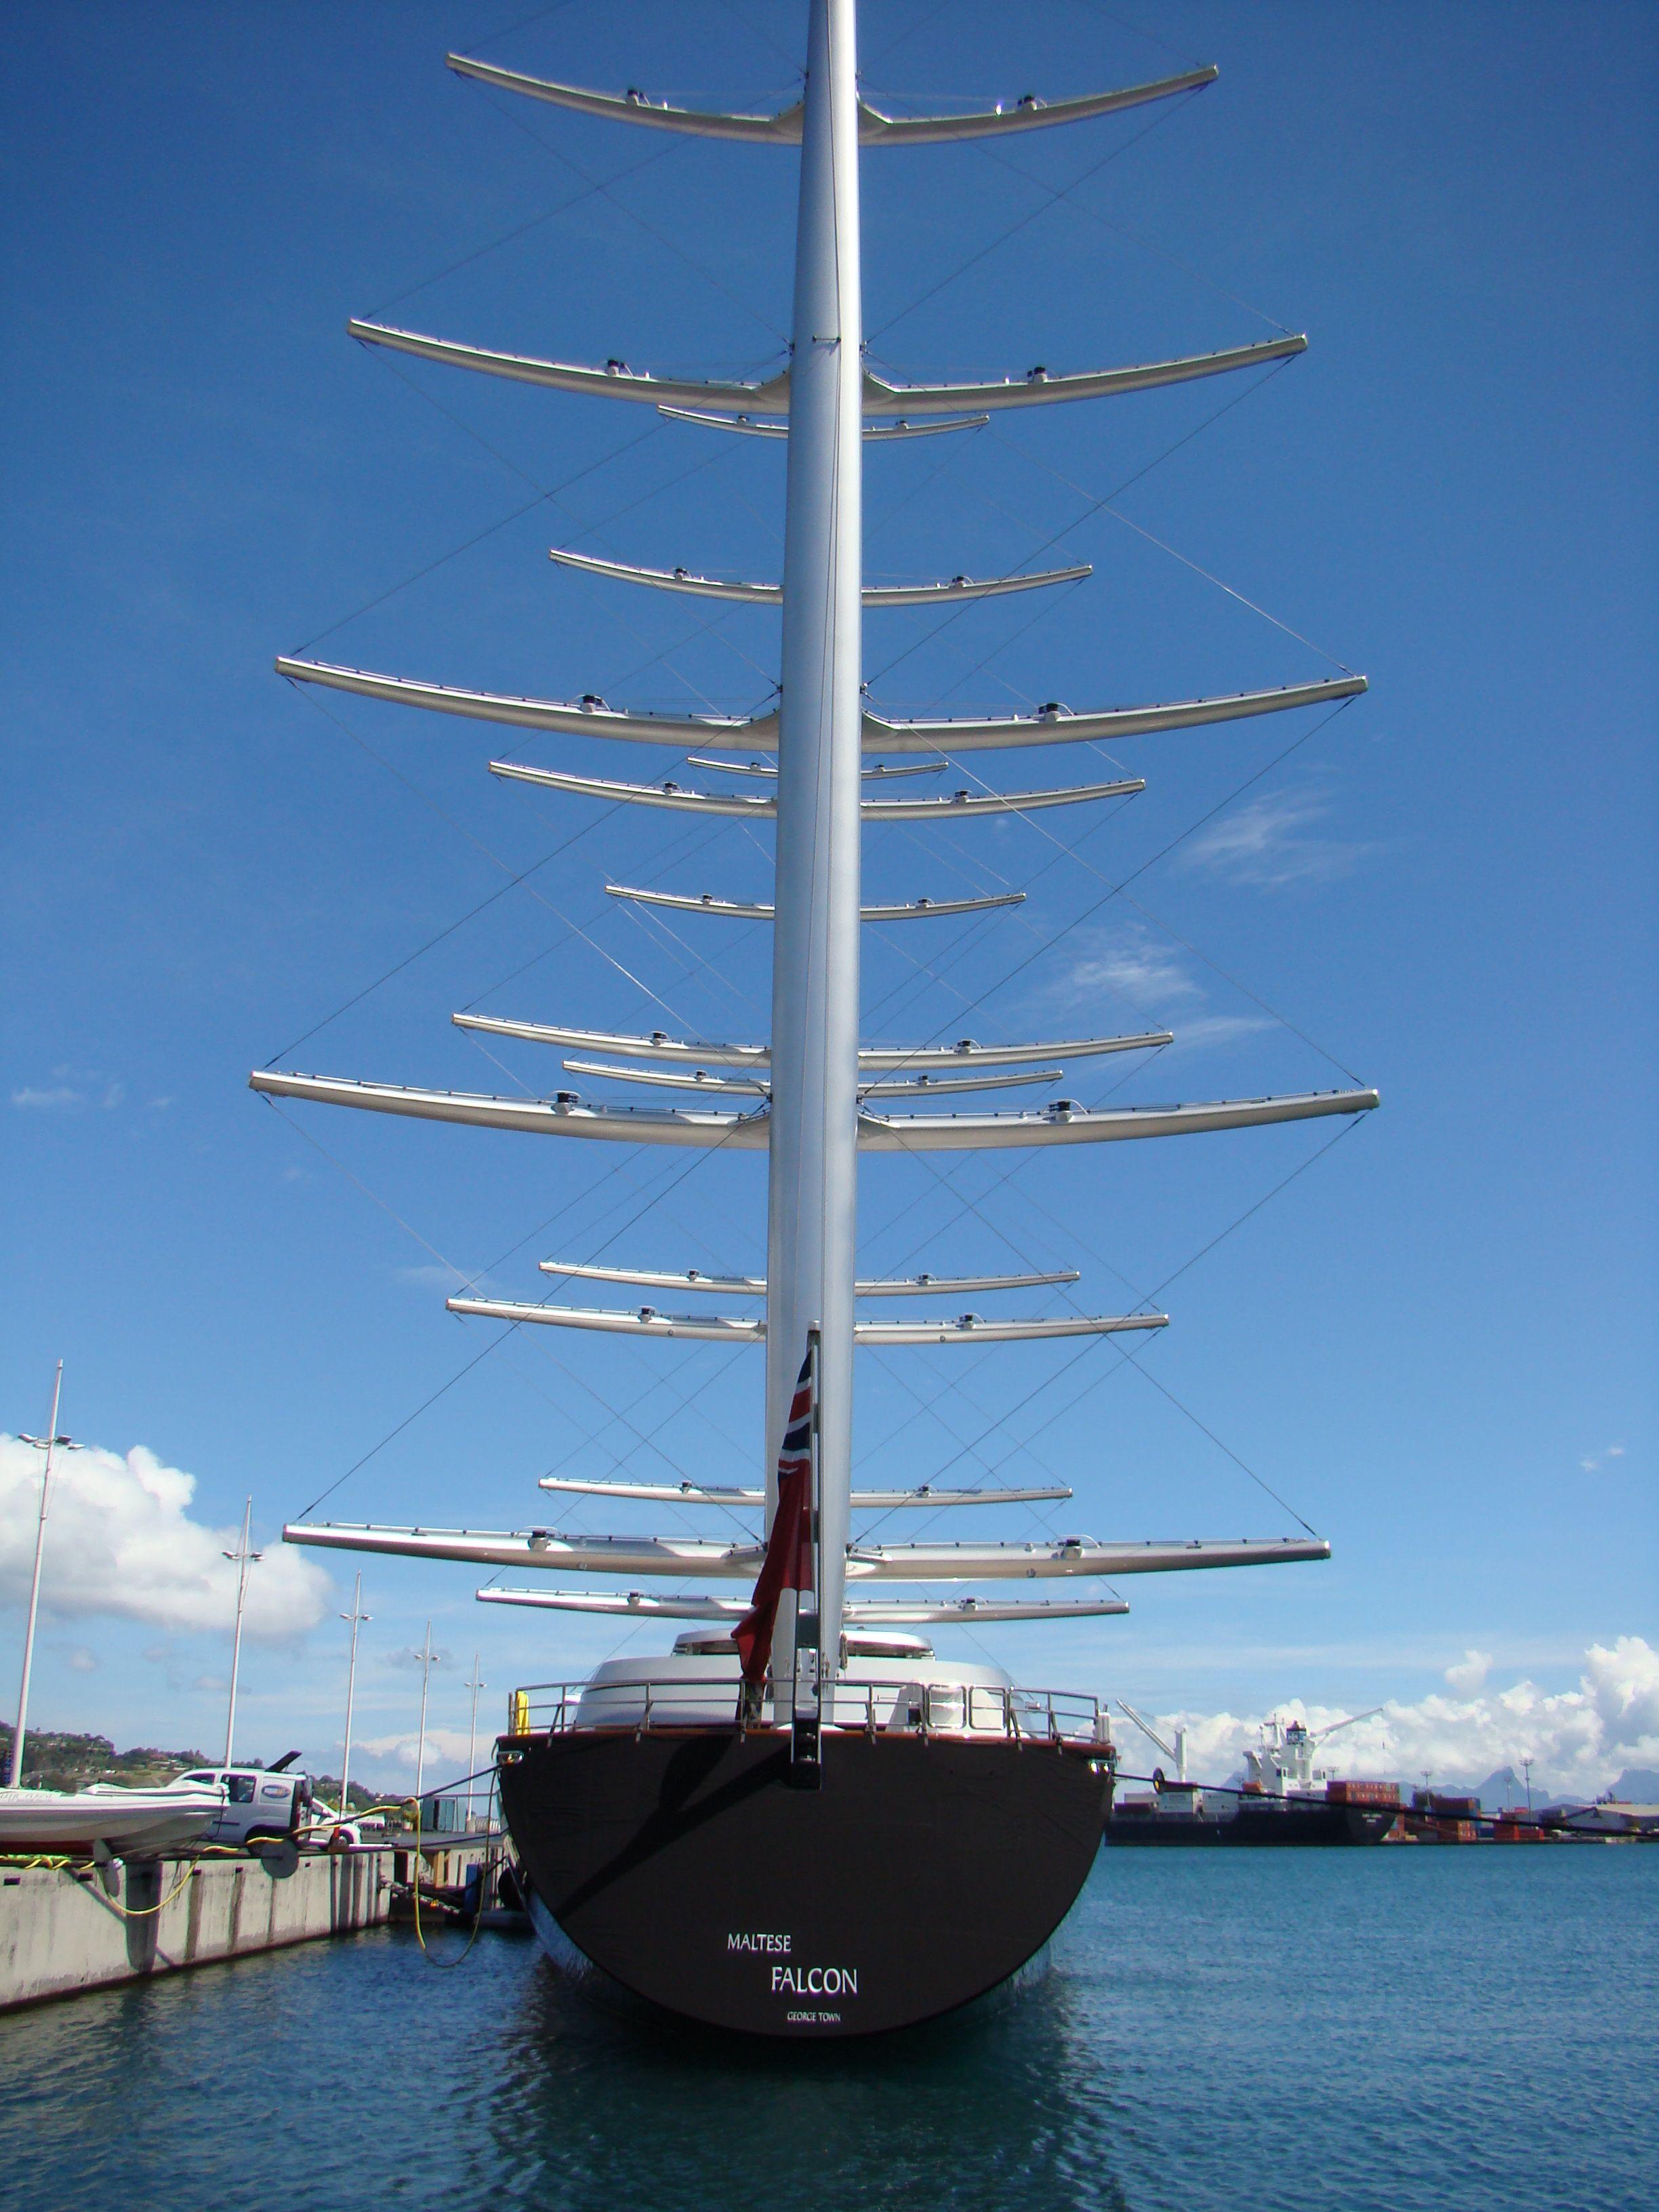 Yacht Maltese Falcon Sailing Yacht Boats Luxury Yacht Boat